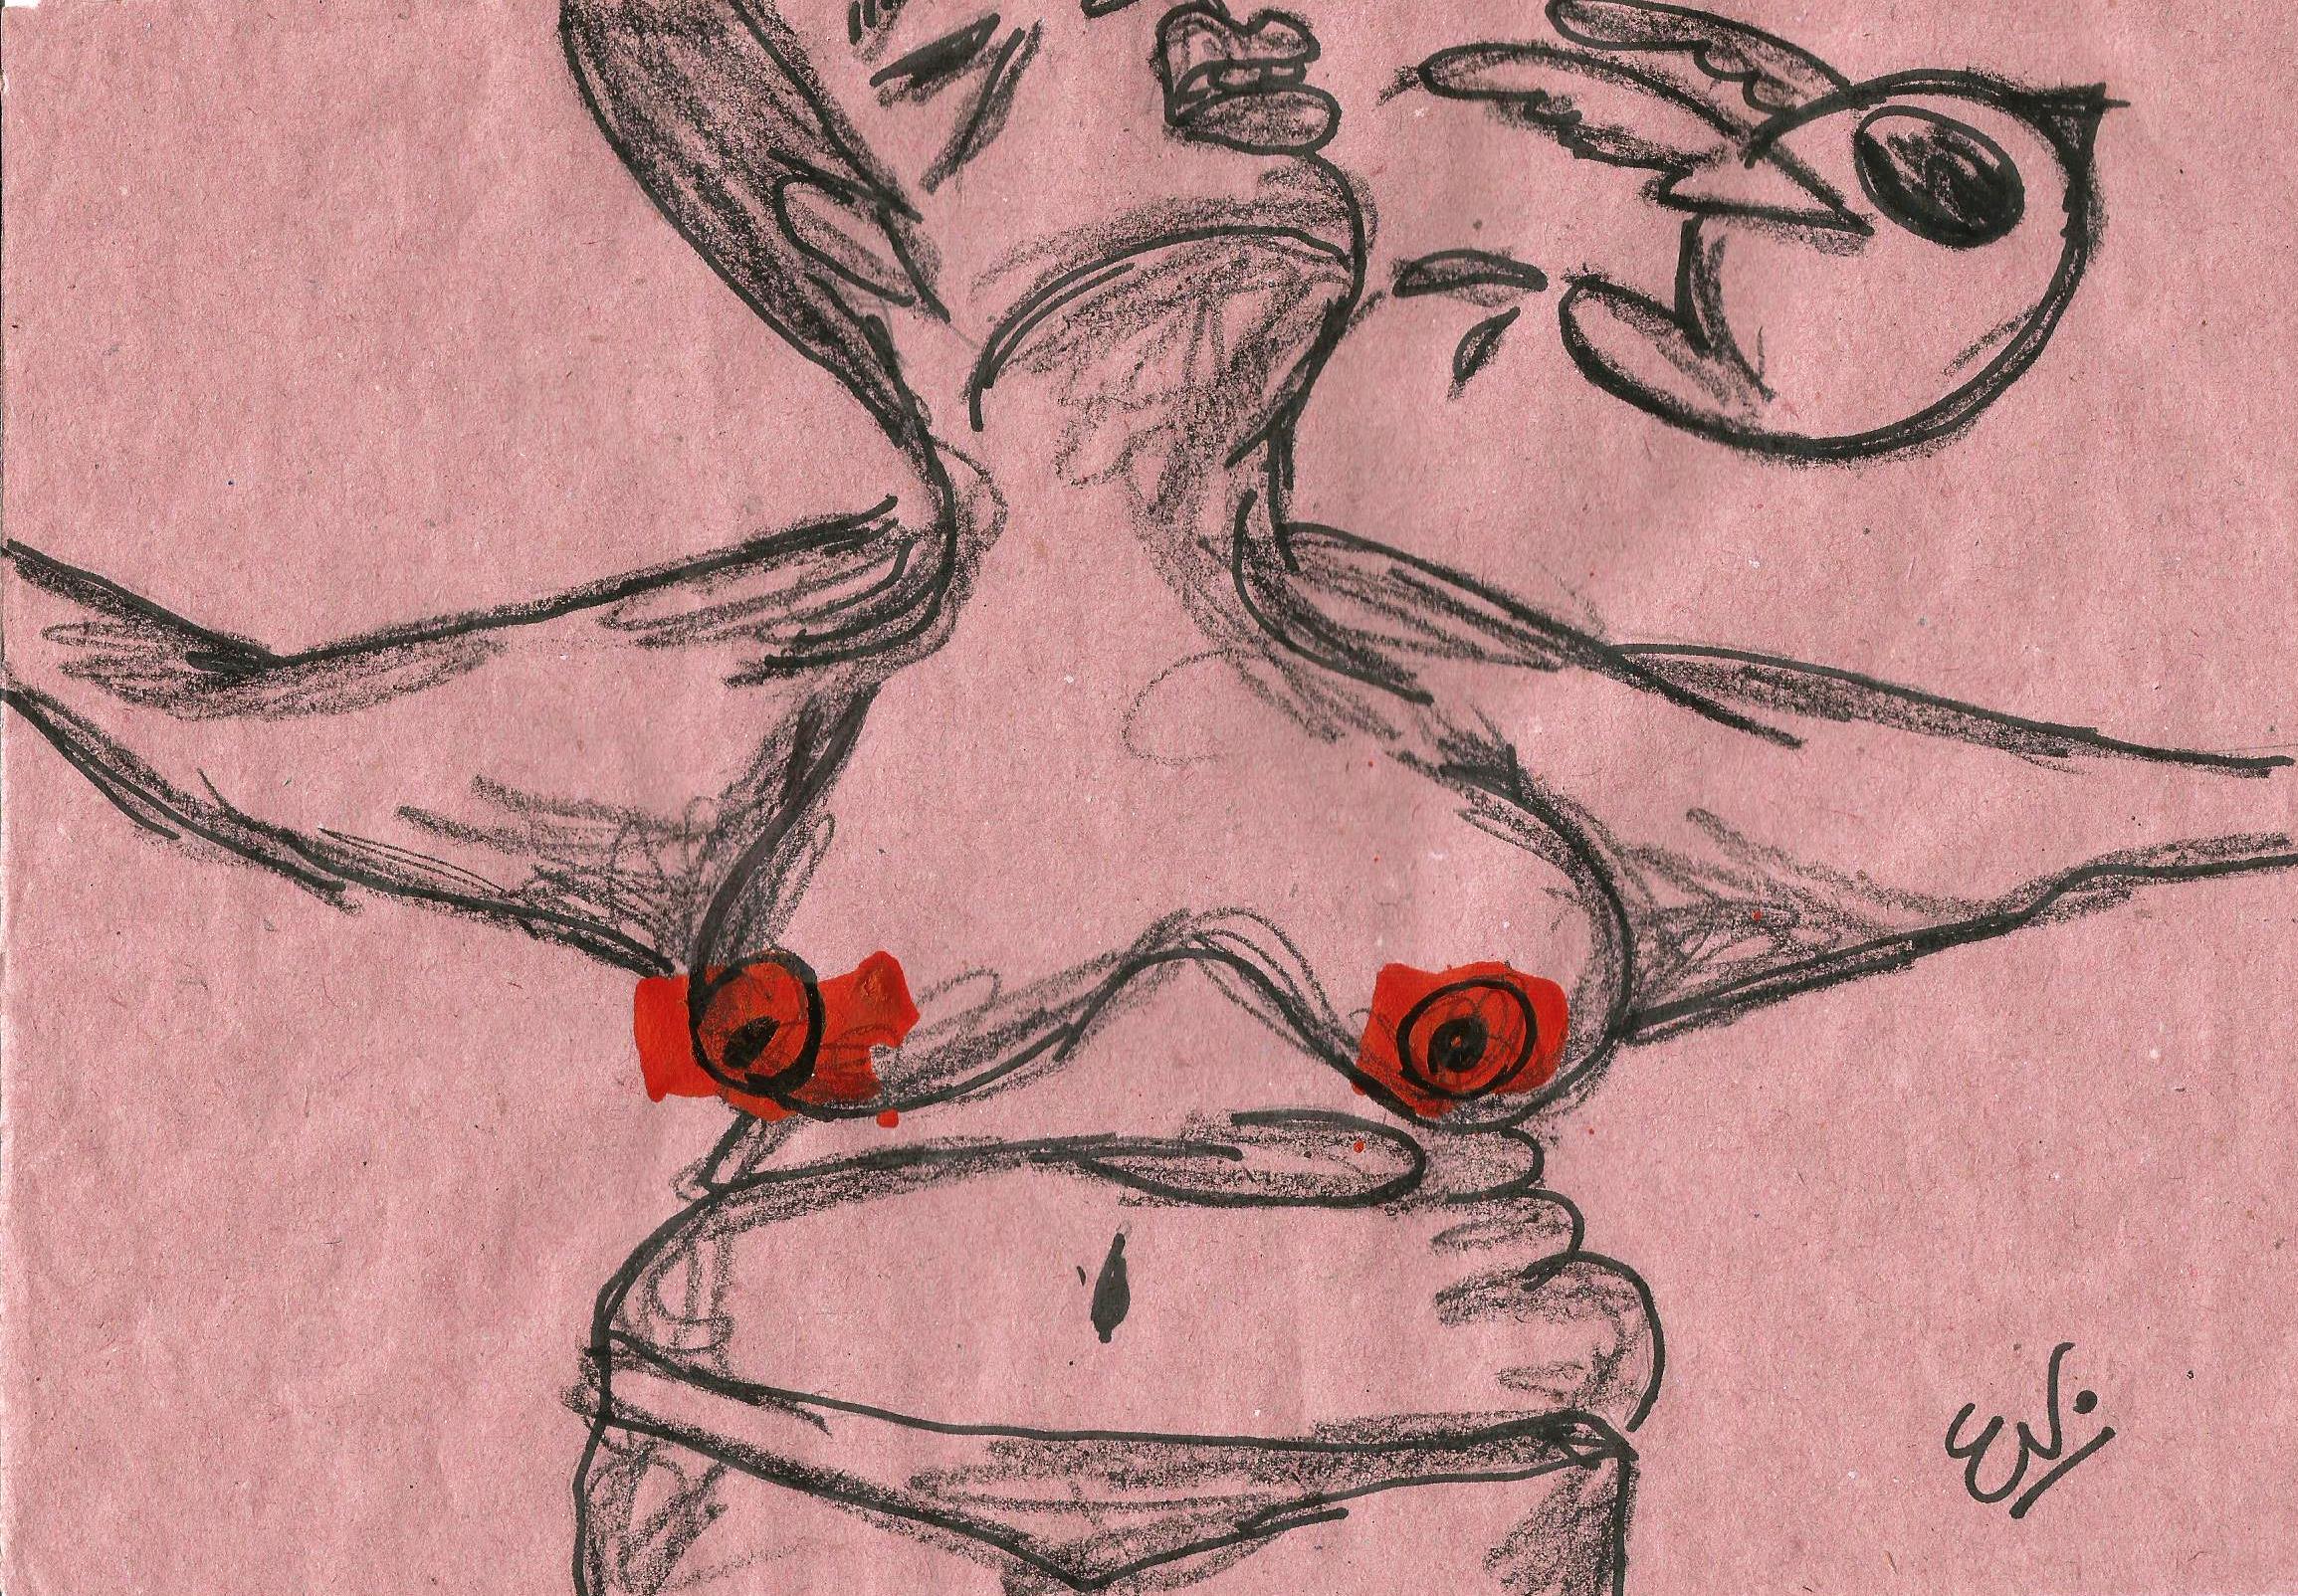 A poesia lésbica marginal existe e resiste!